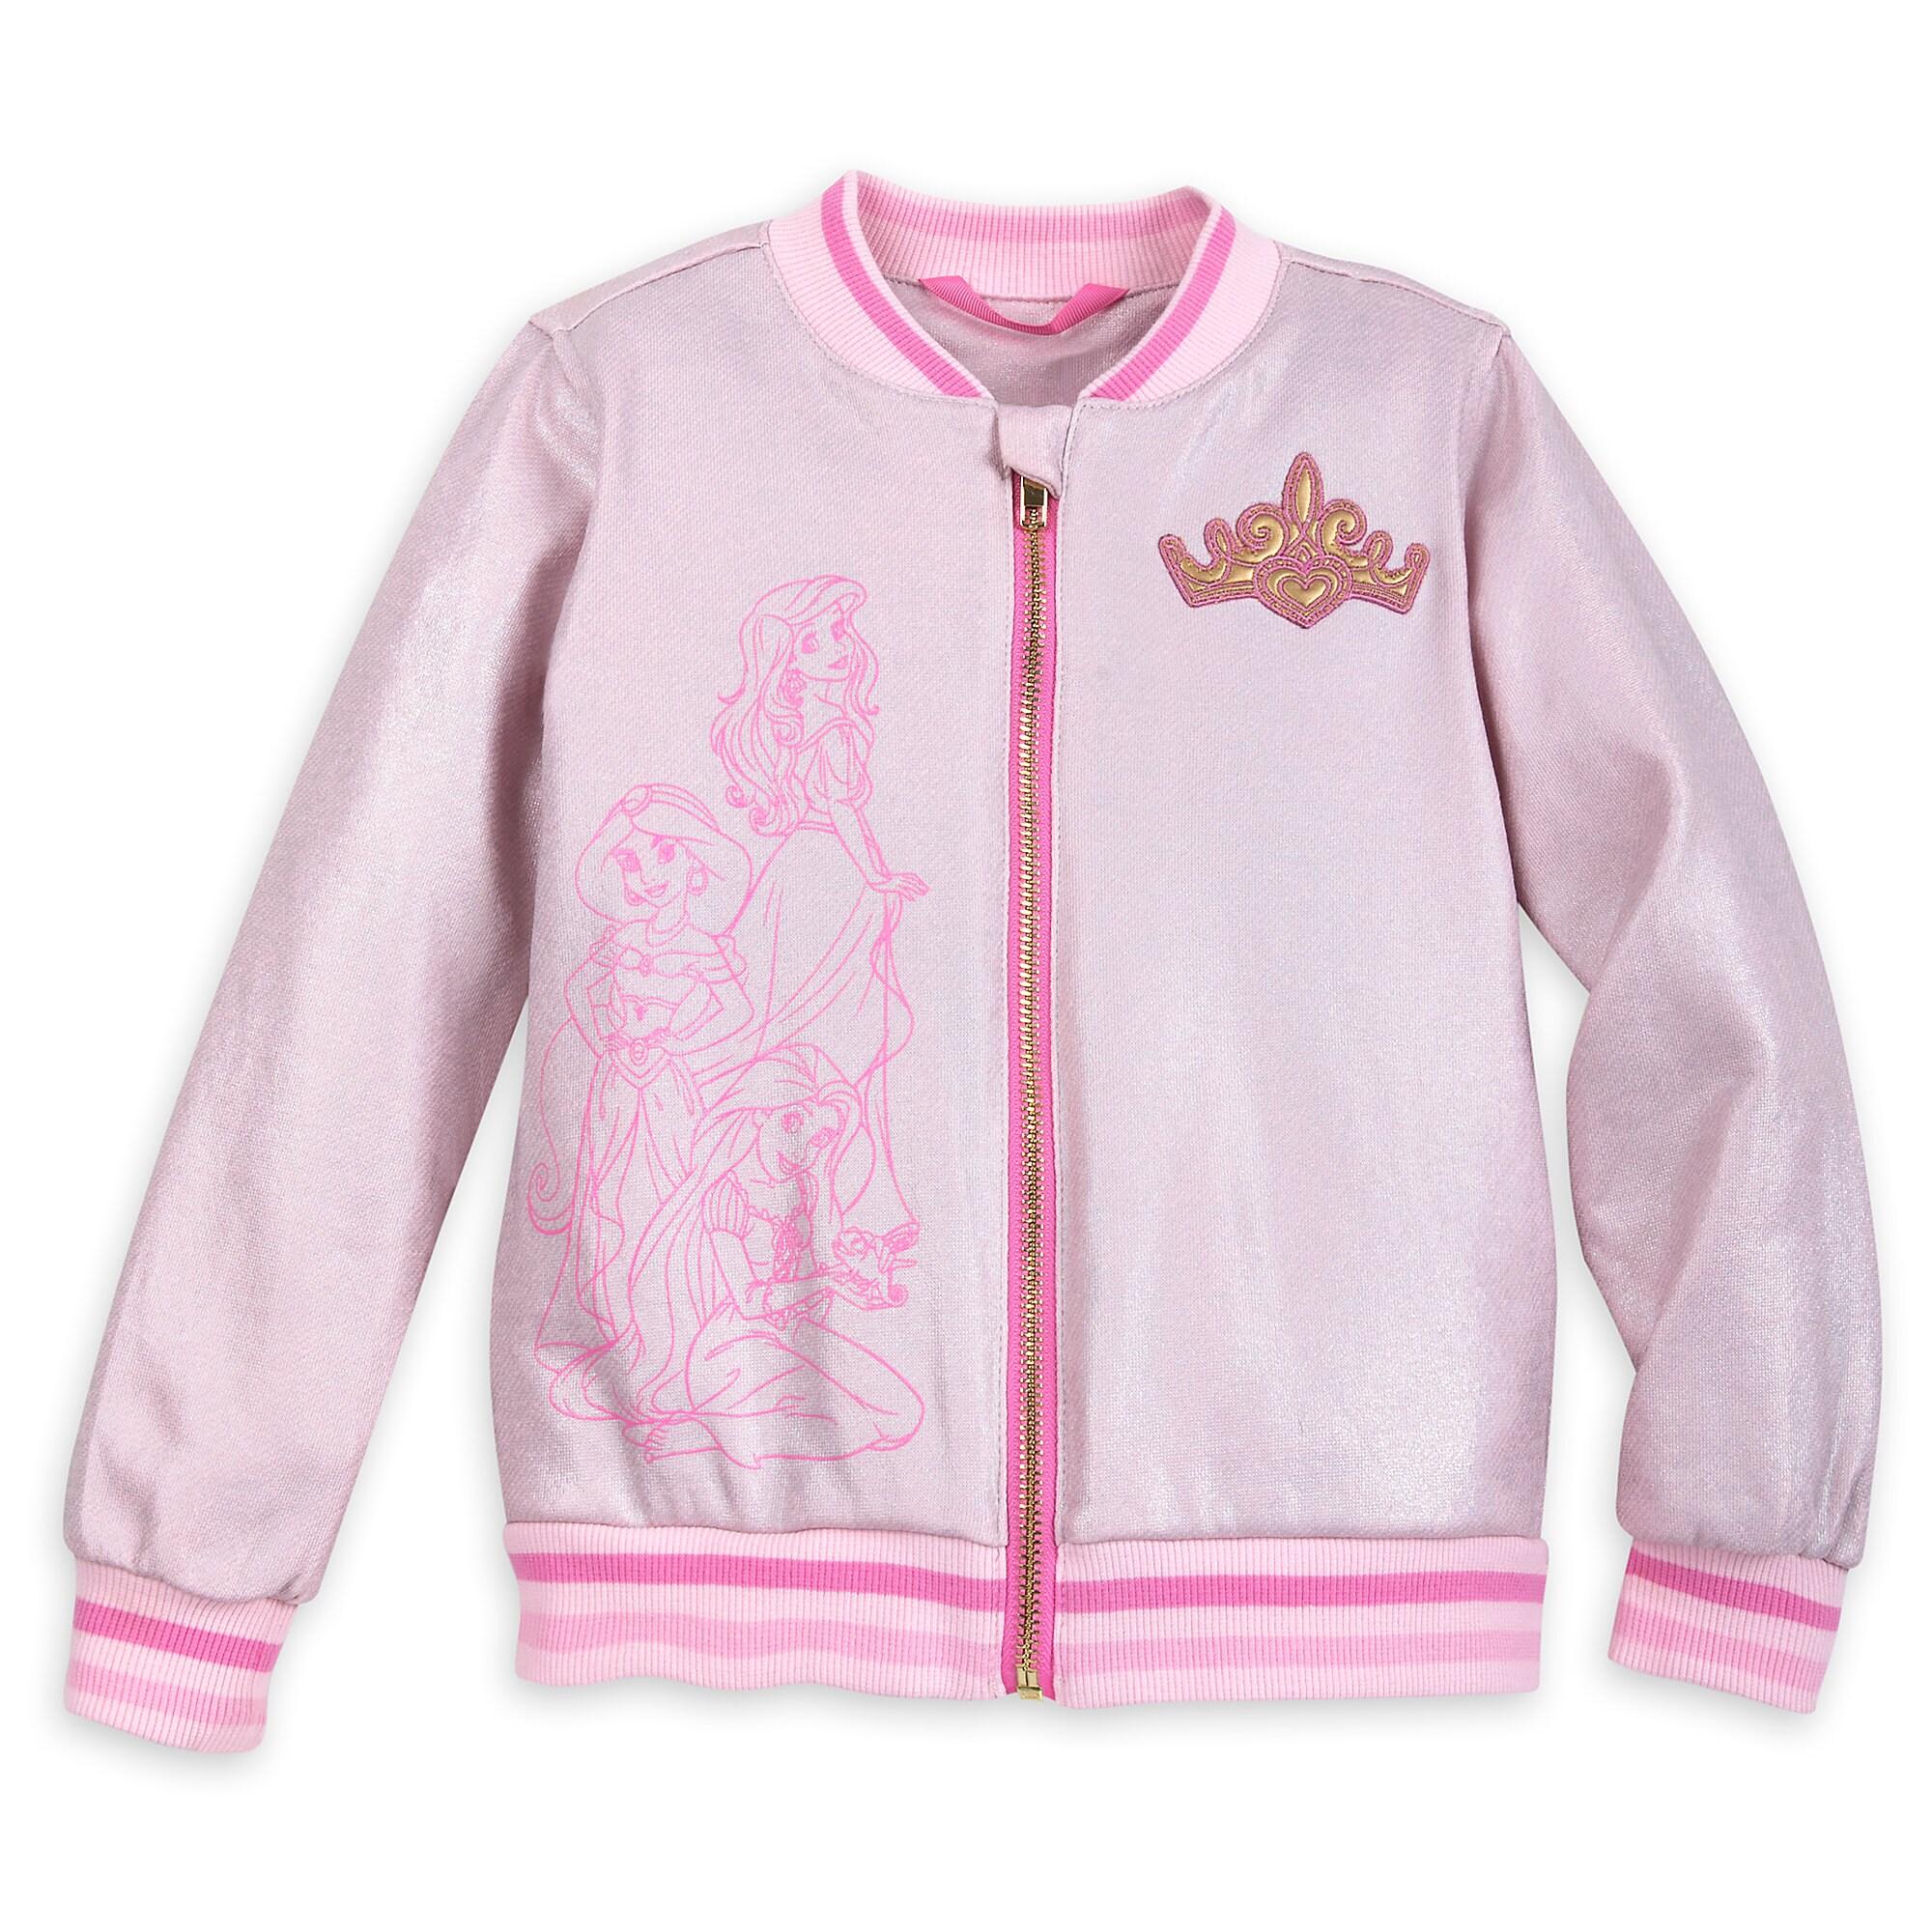 Disney Princess Shimmering Bomber Jacket for Girls